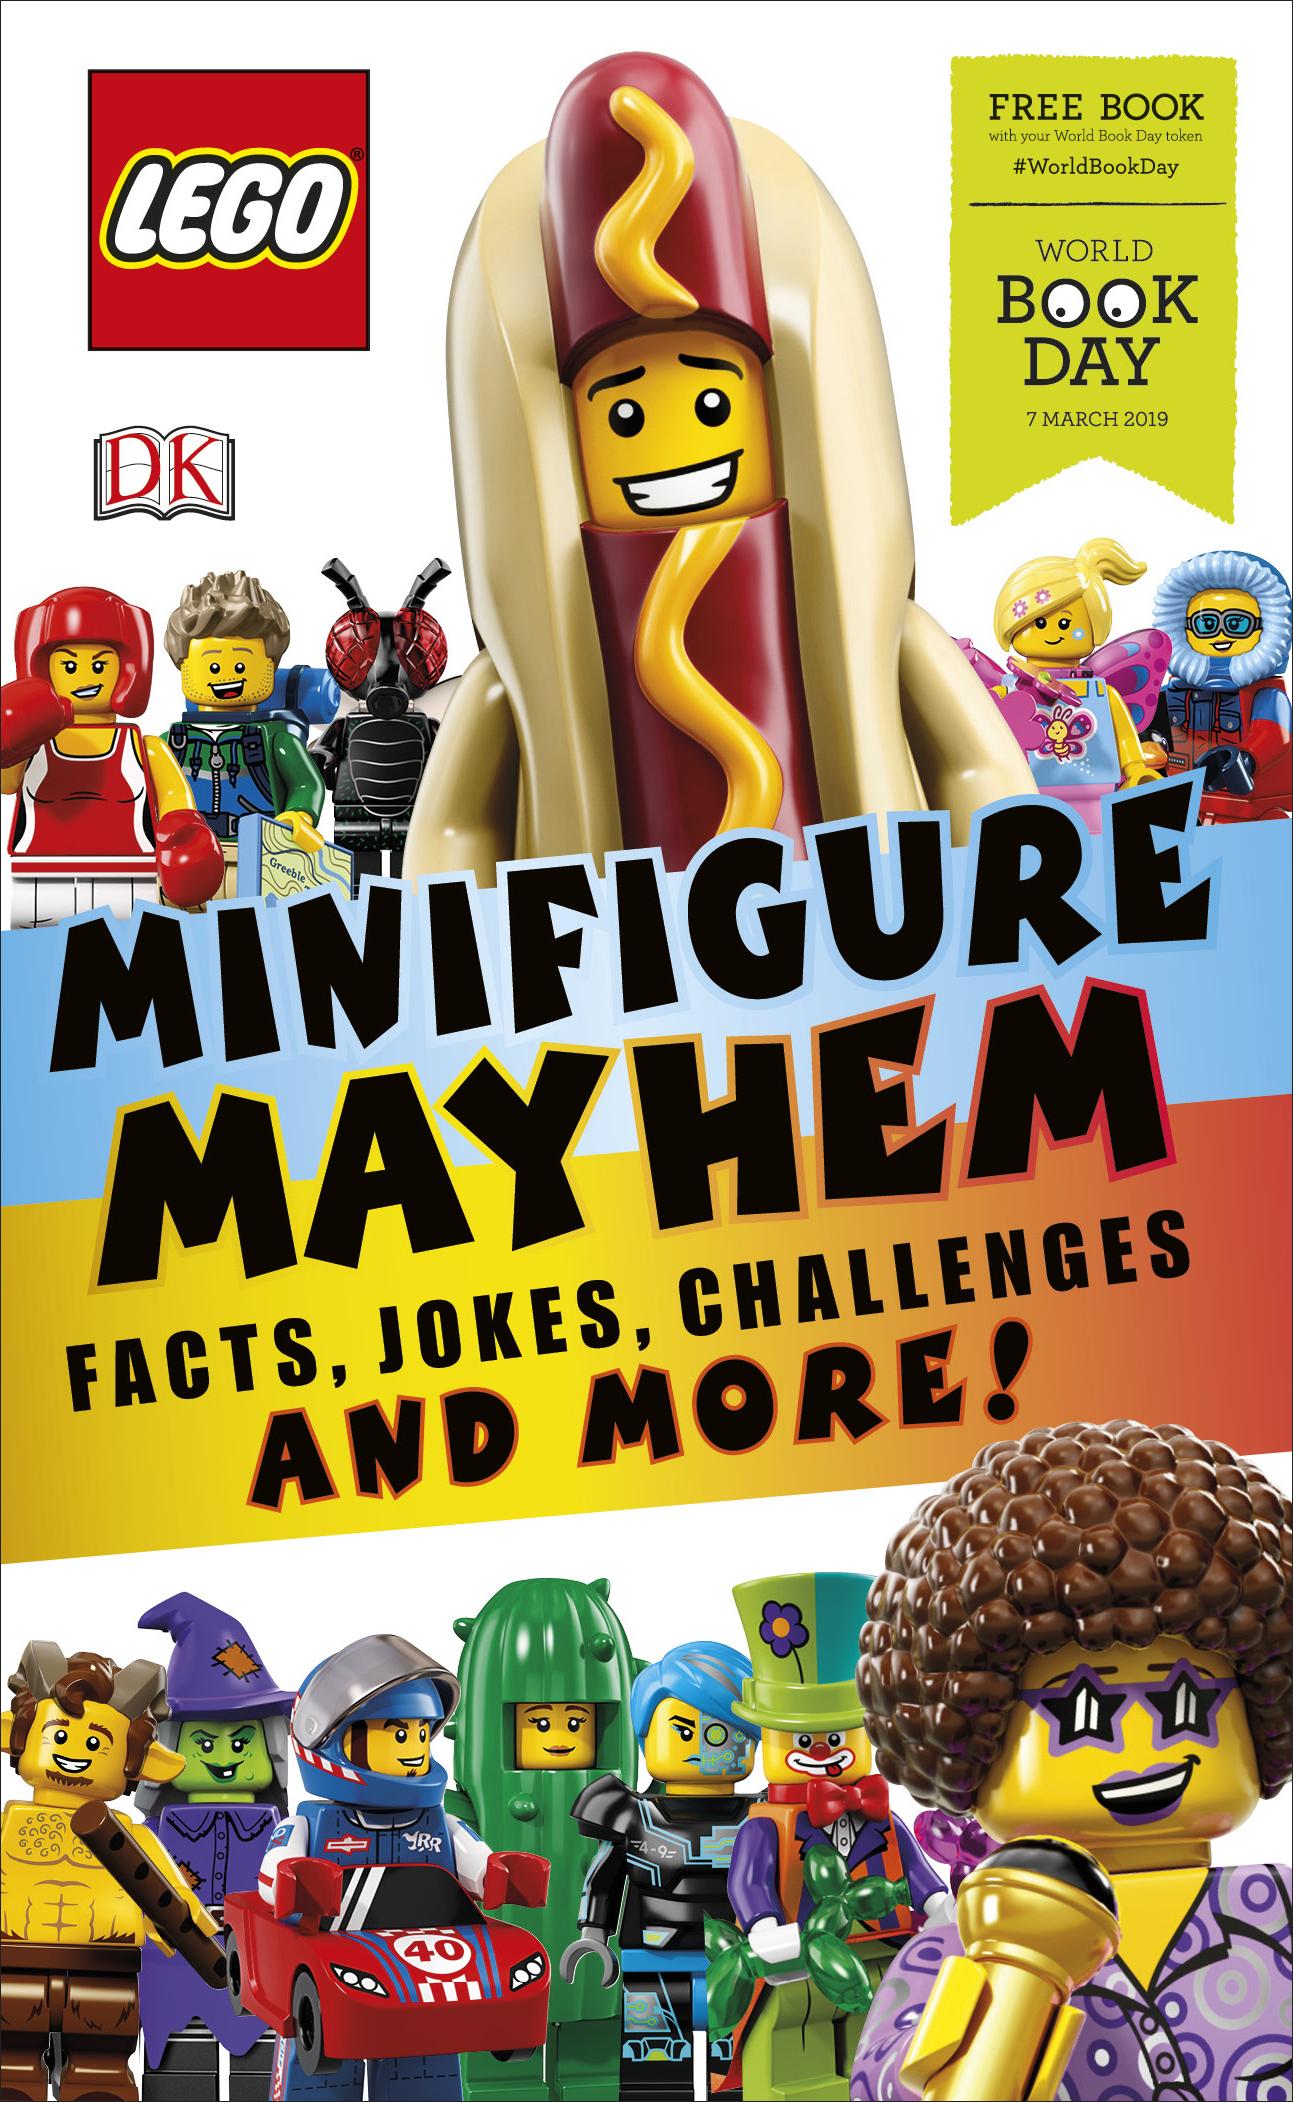 Lego Minifigure Mayhem Hi-res jacket.jpg